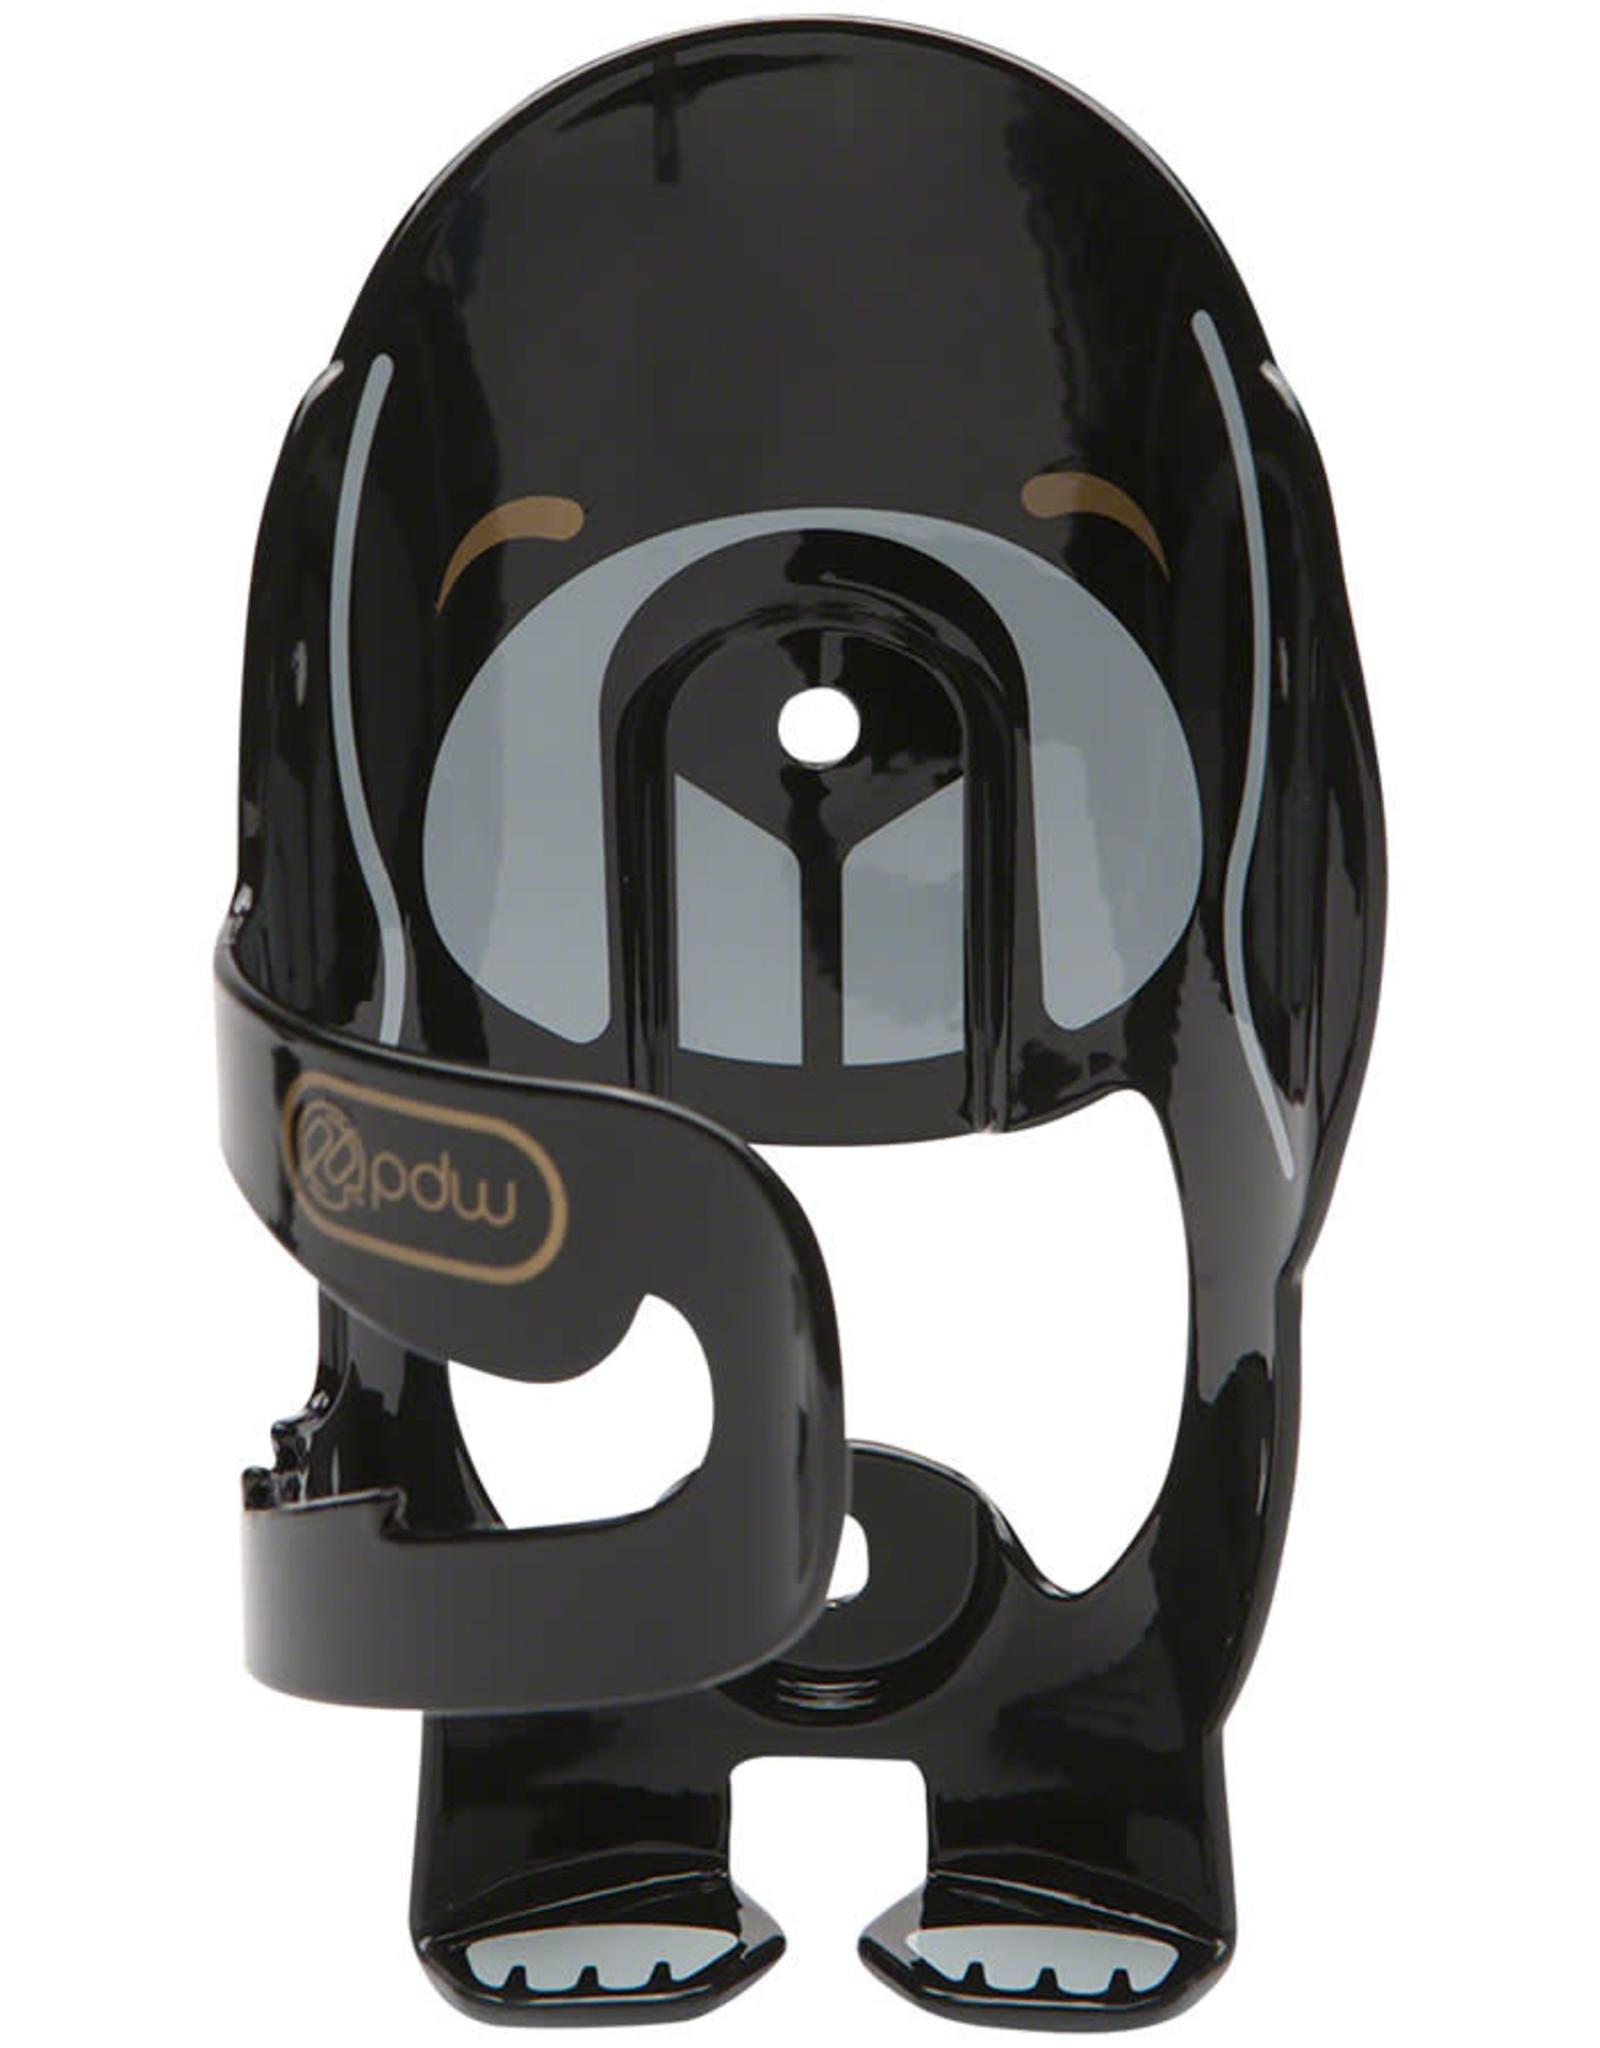 PDW Portland Design Works Very Good Dog Water Bottle Cage: Black